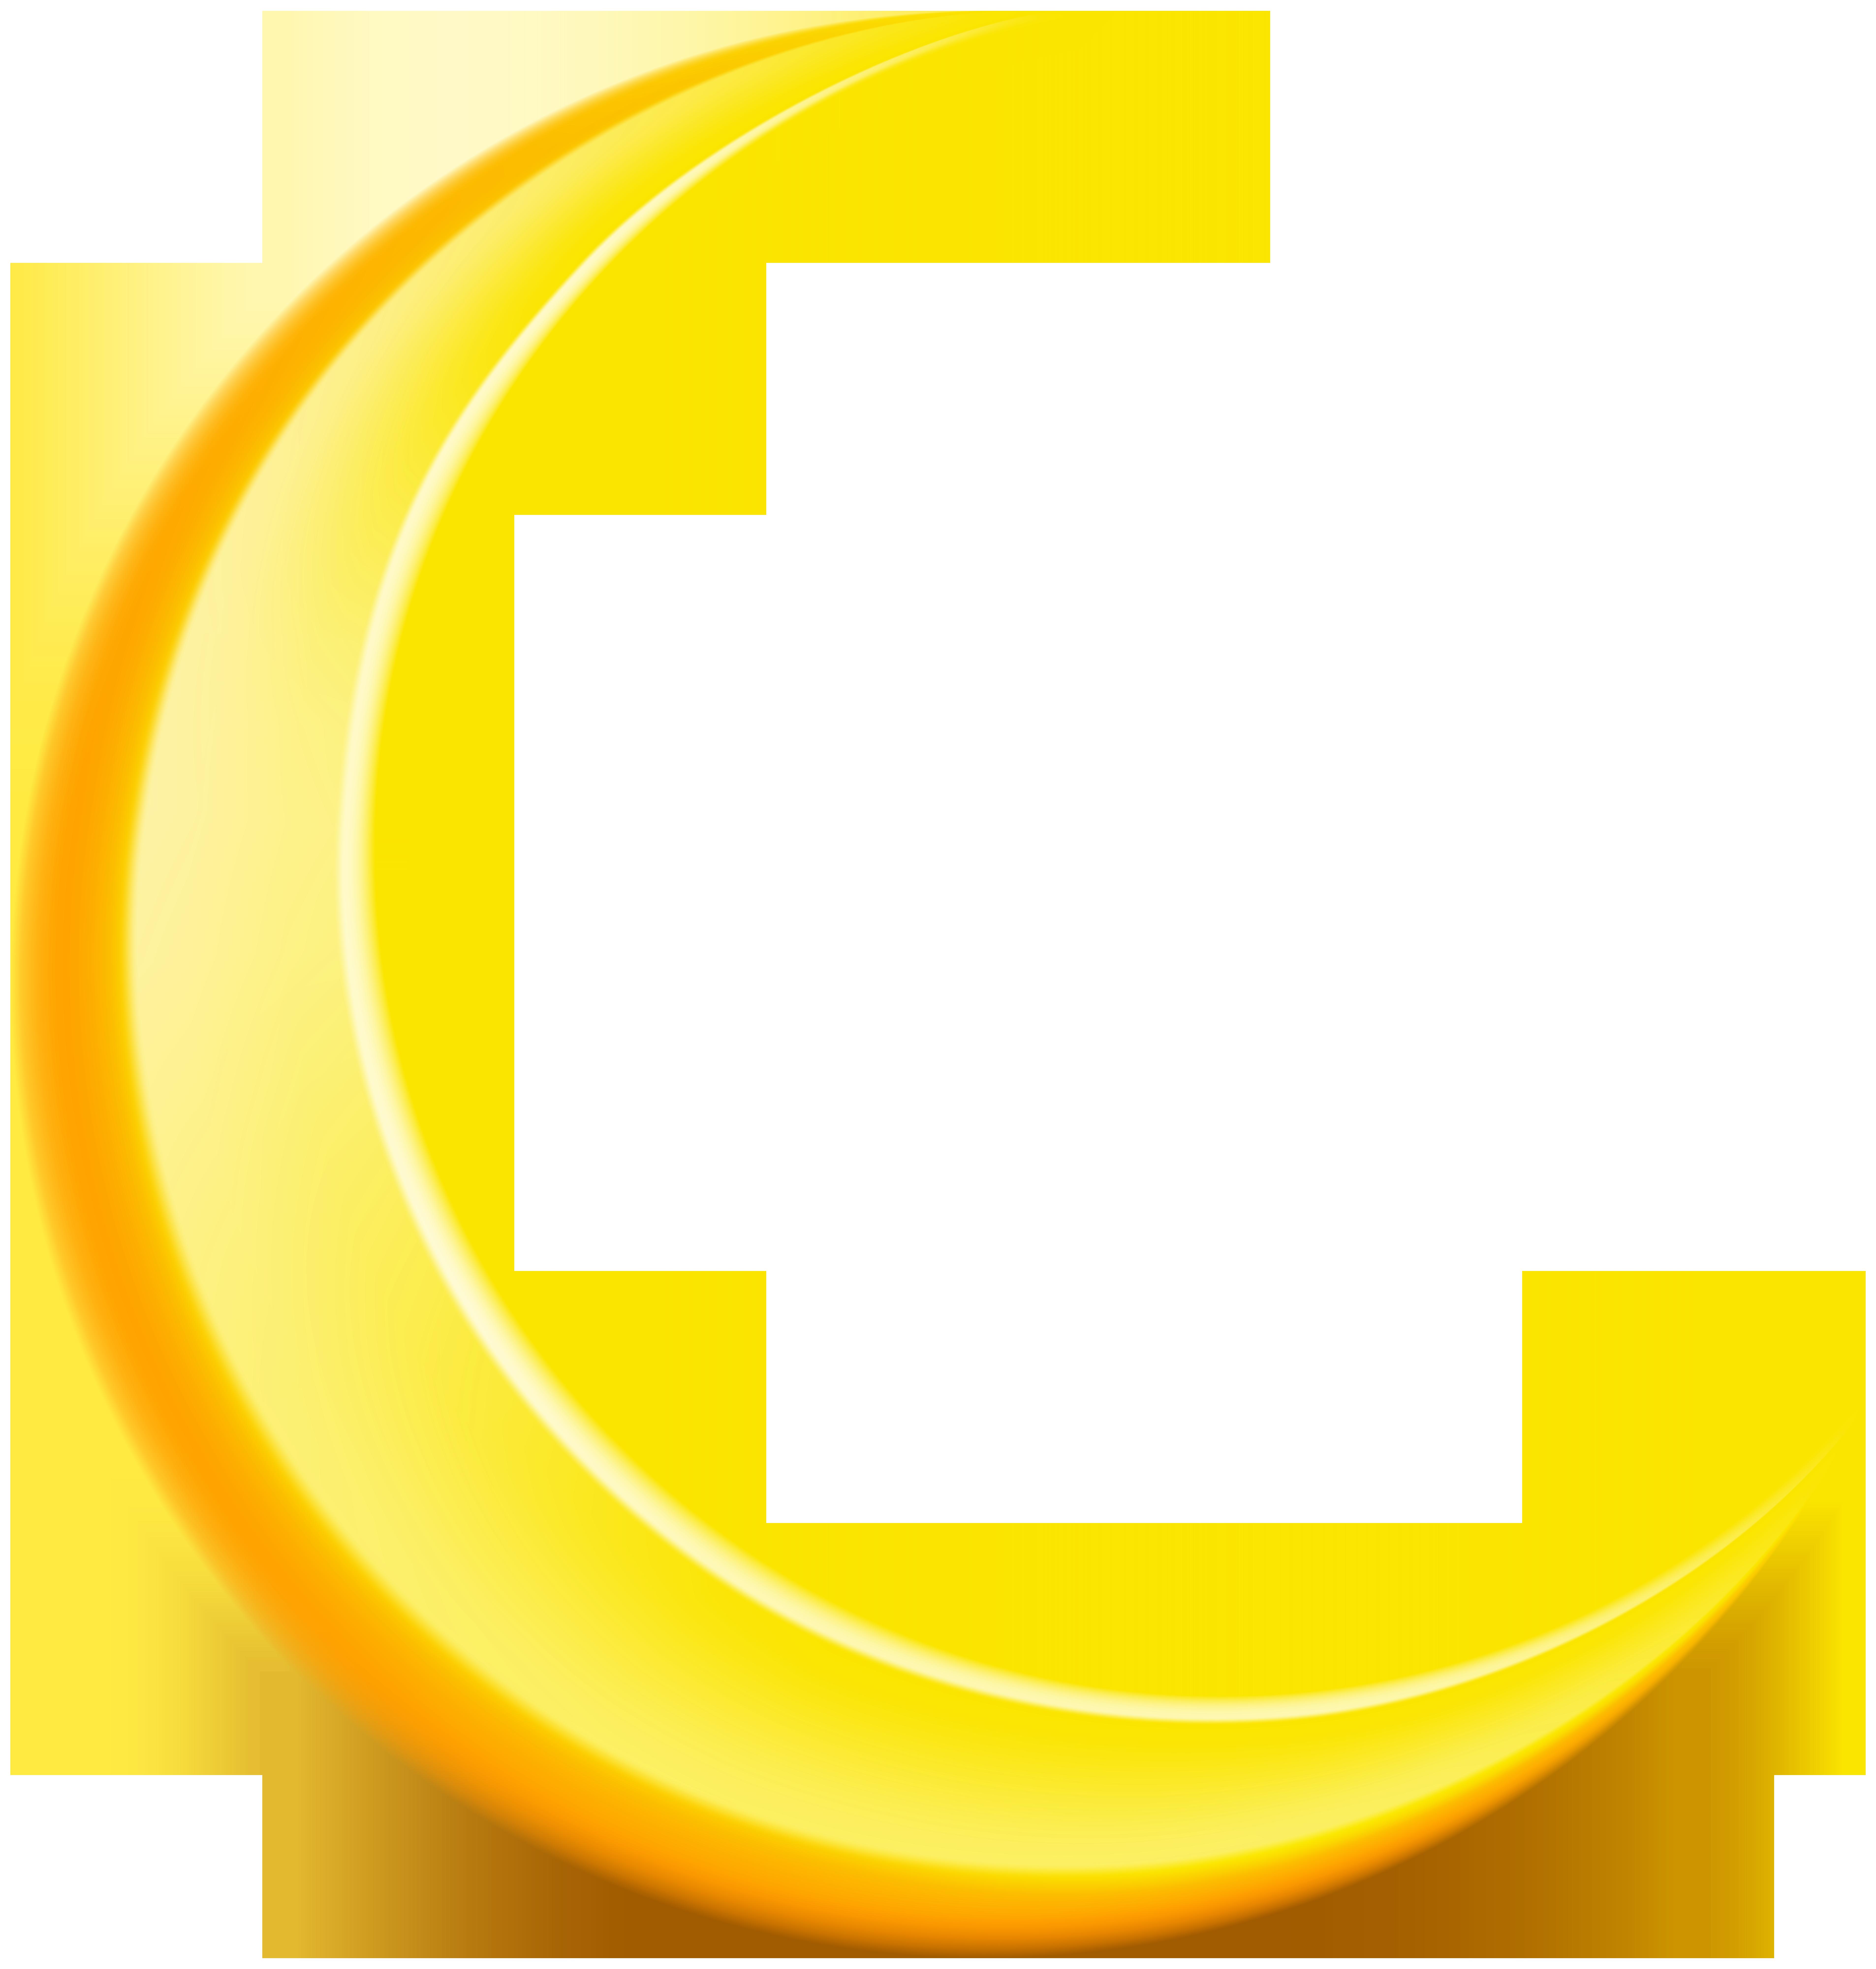 New Moon PNG Clip Art Image.